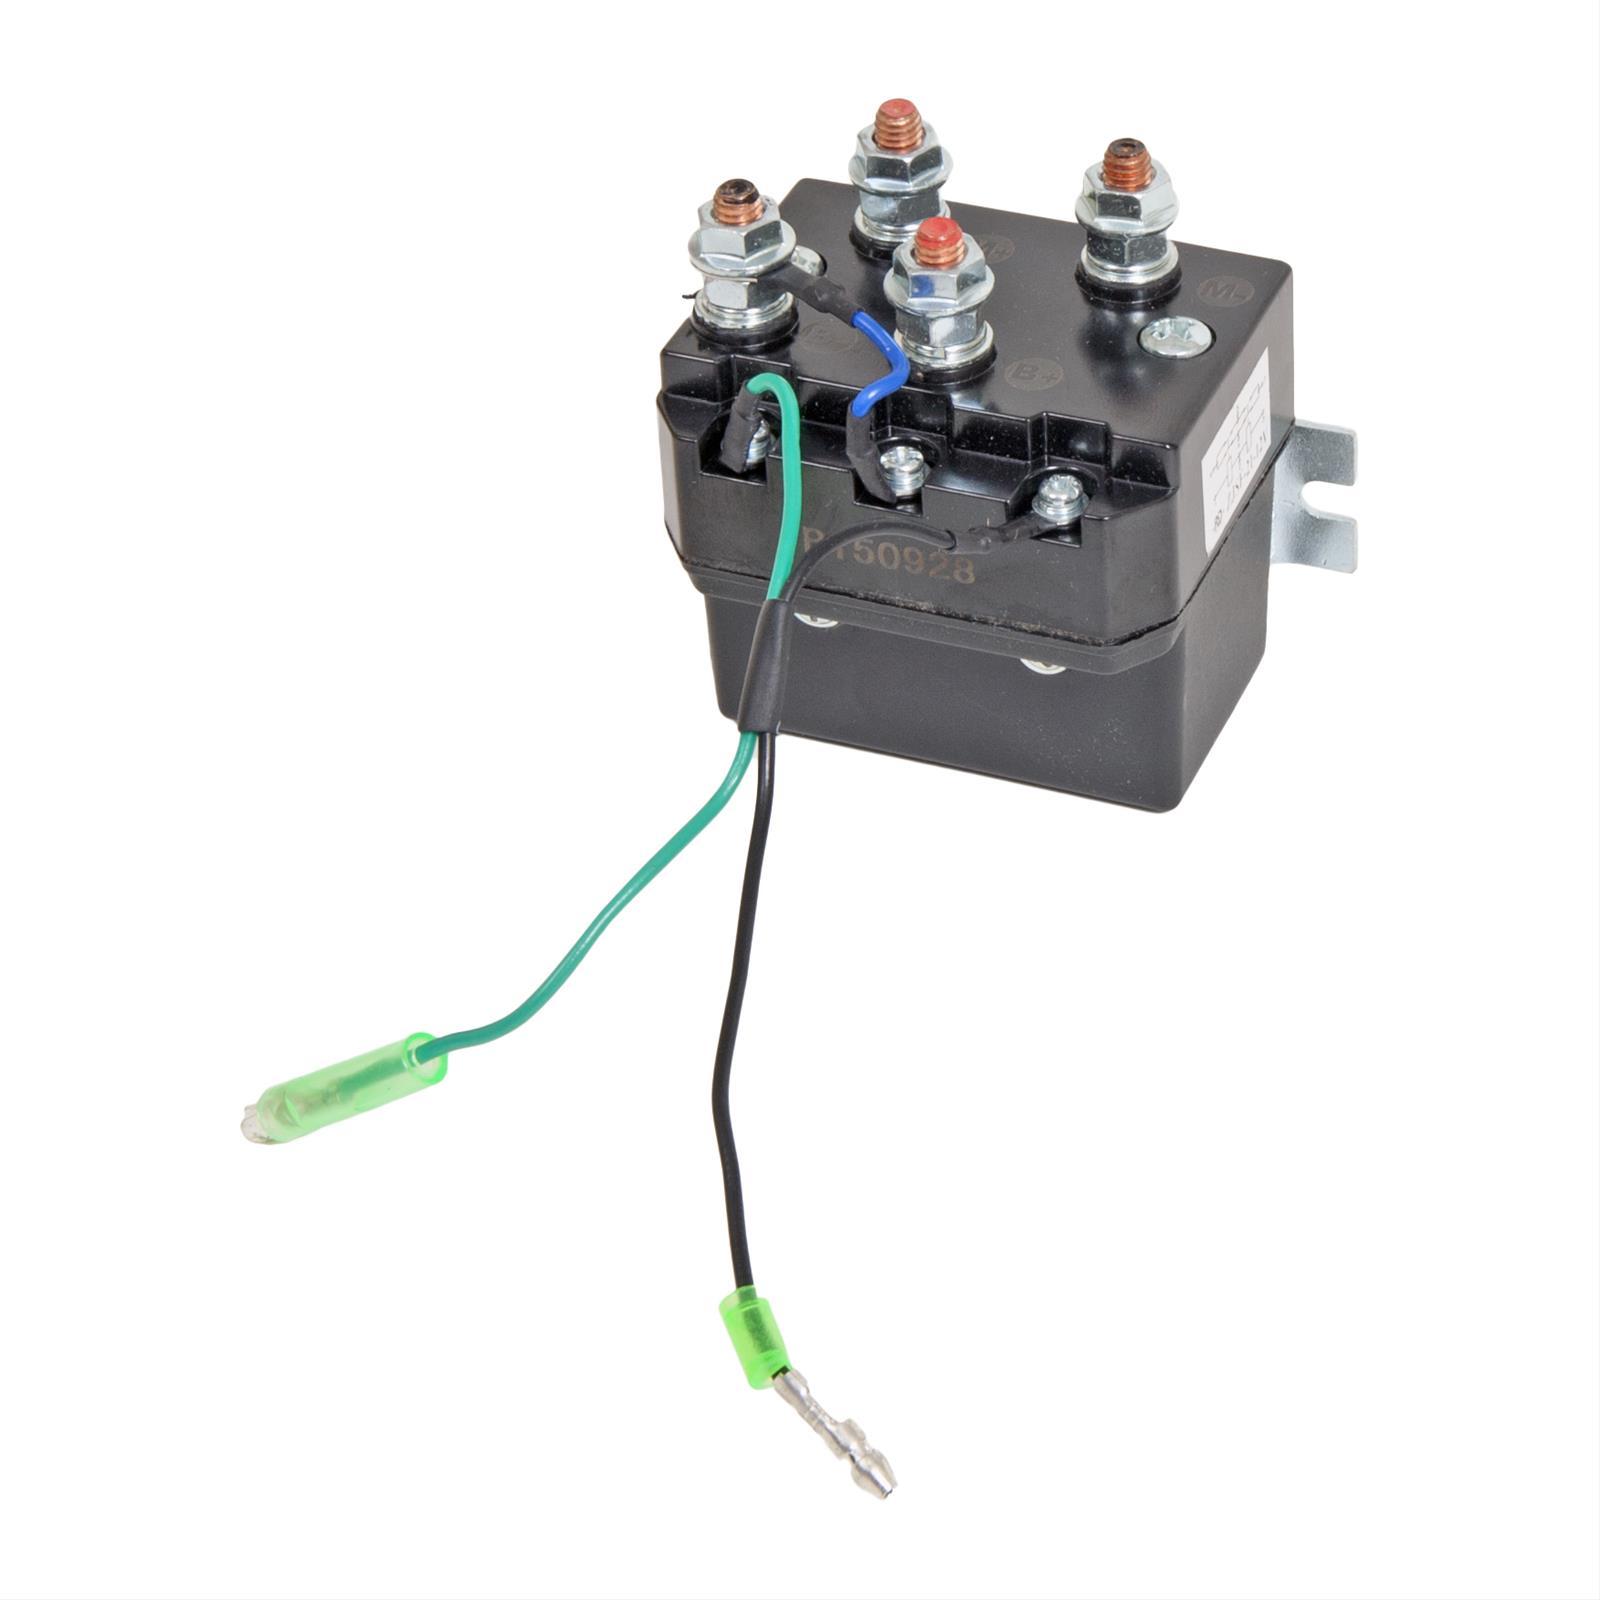 smittybilt winch solenoid wiring diagram reversing switch warn m12000 remote control atv